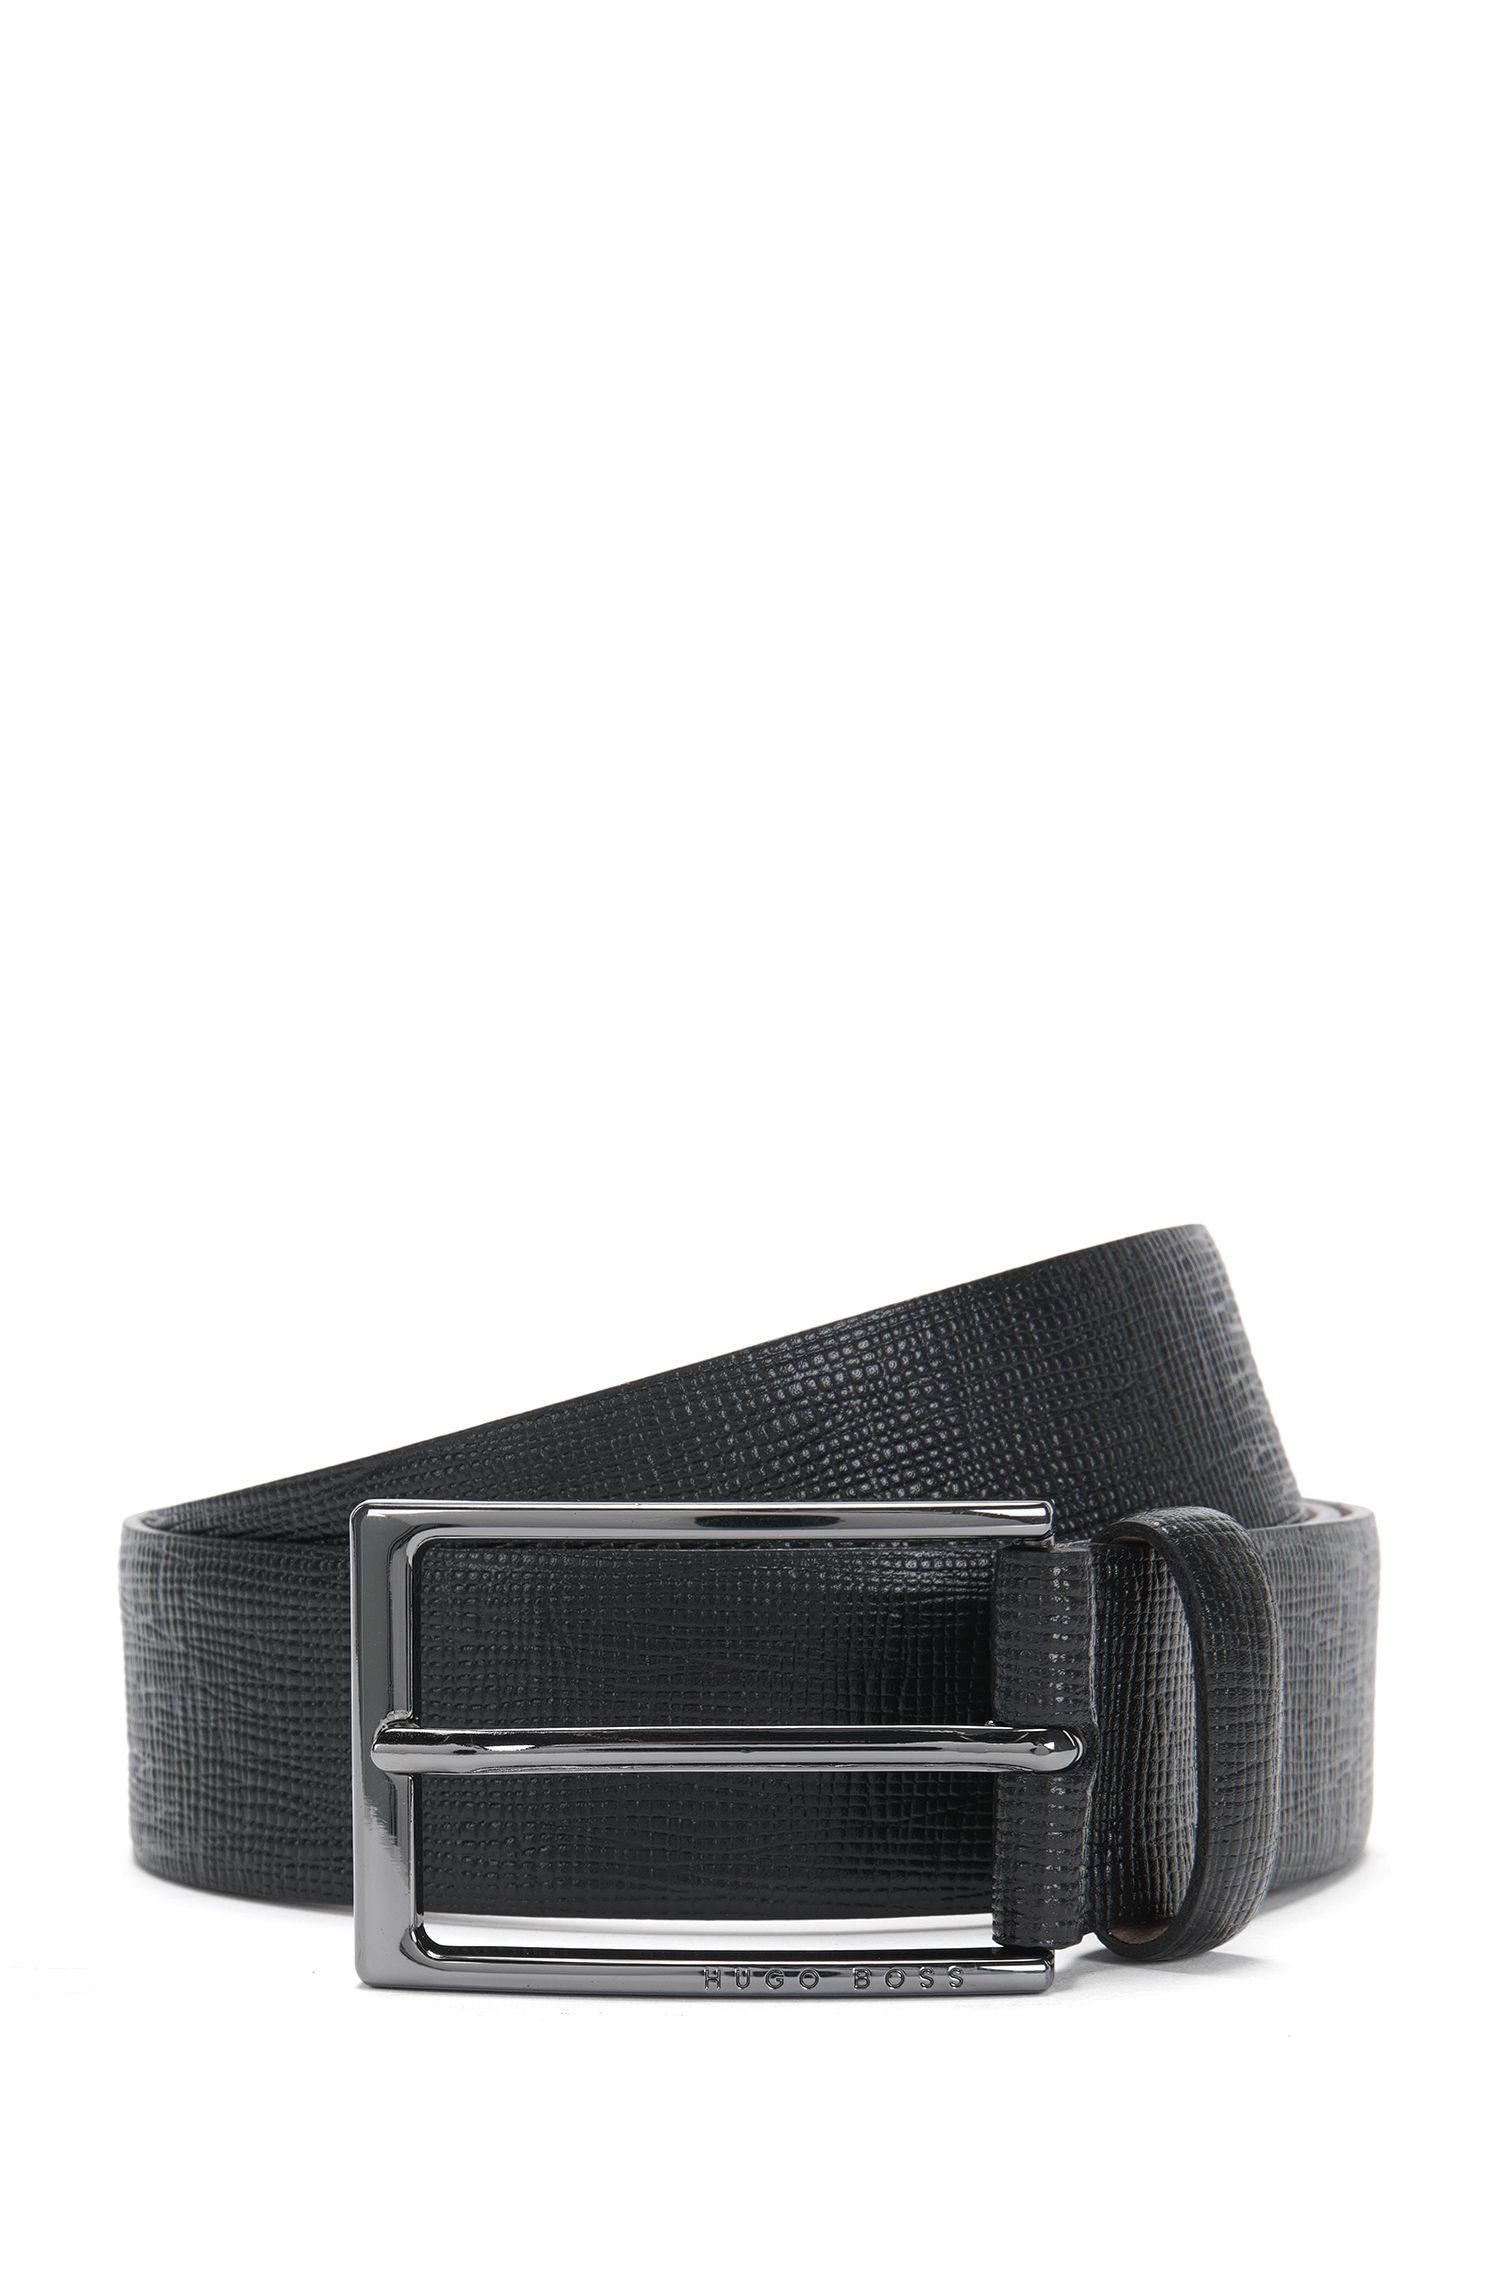 Leather Saffiano Embossed Belt | Naux-G_Sz35_ltem